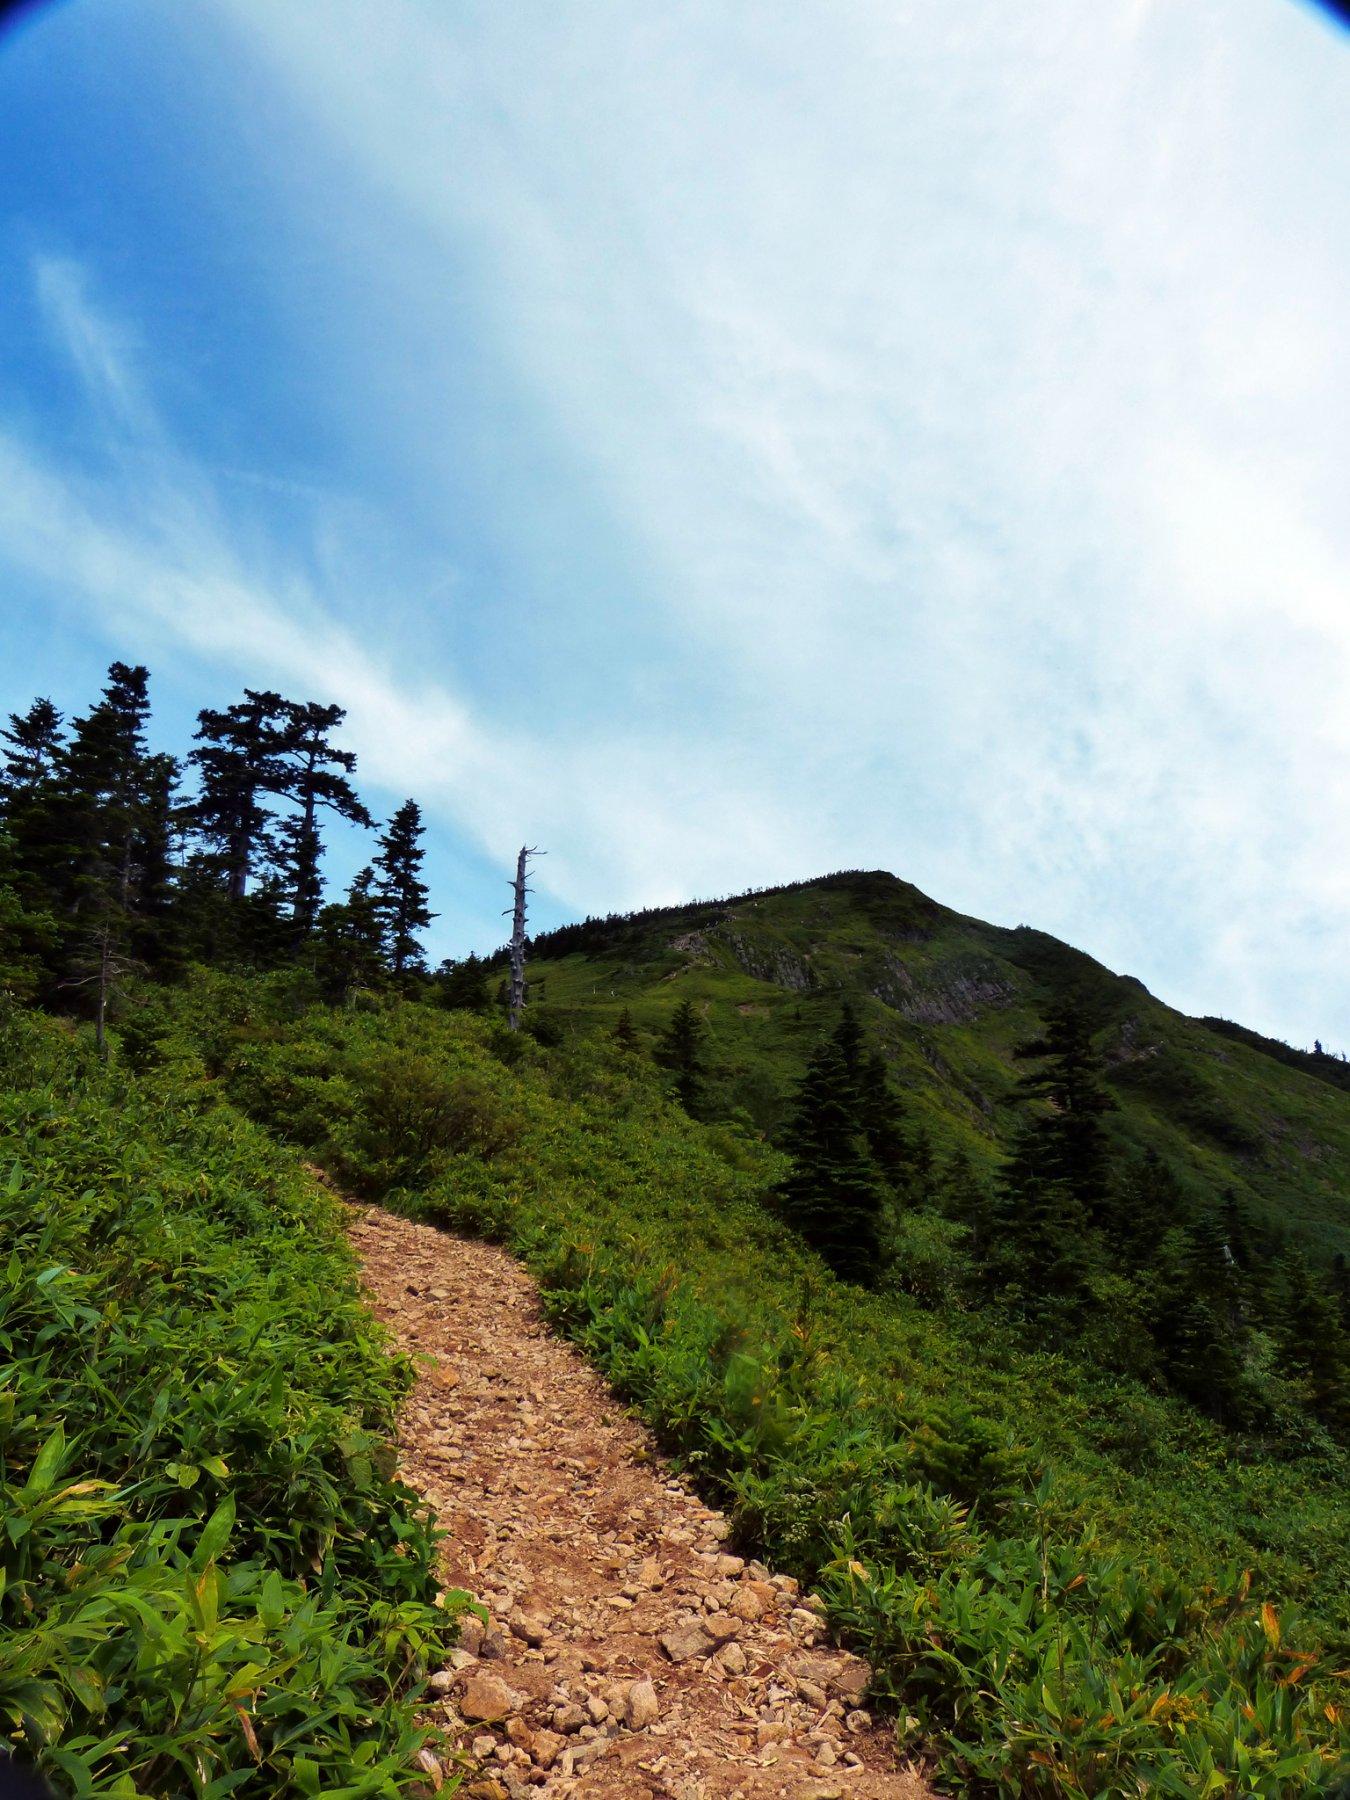 Iwasuge-yama (Monte) da Ichinose, anello per Terako-yama > Higashitate-yama 2018-08-10